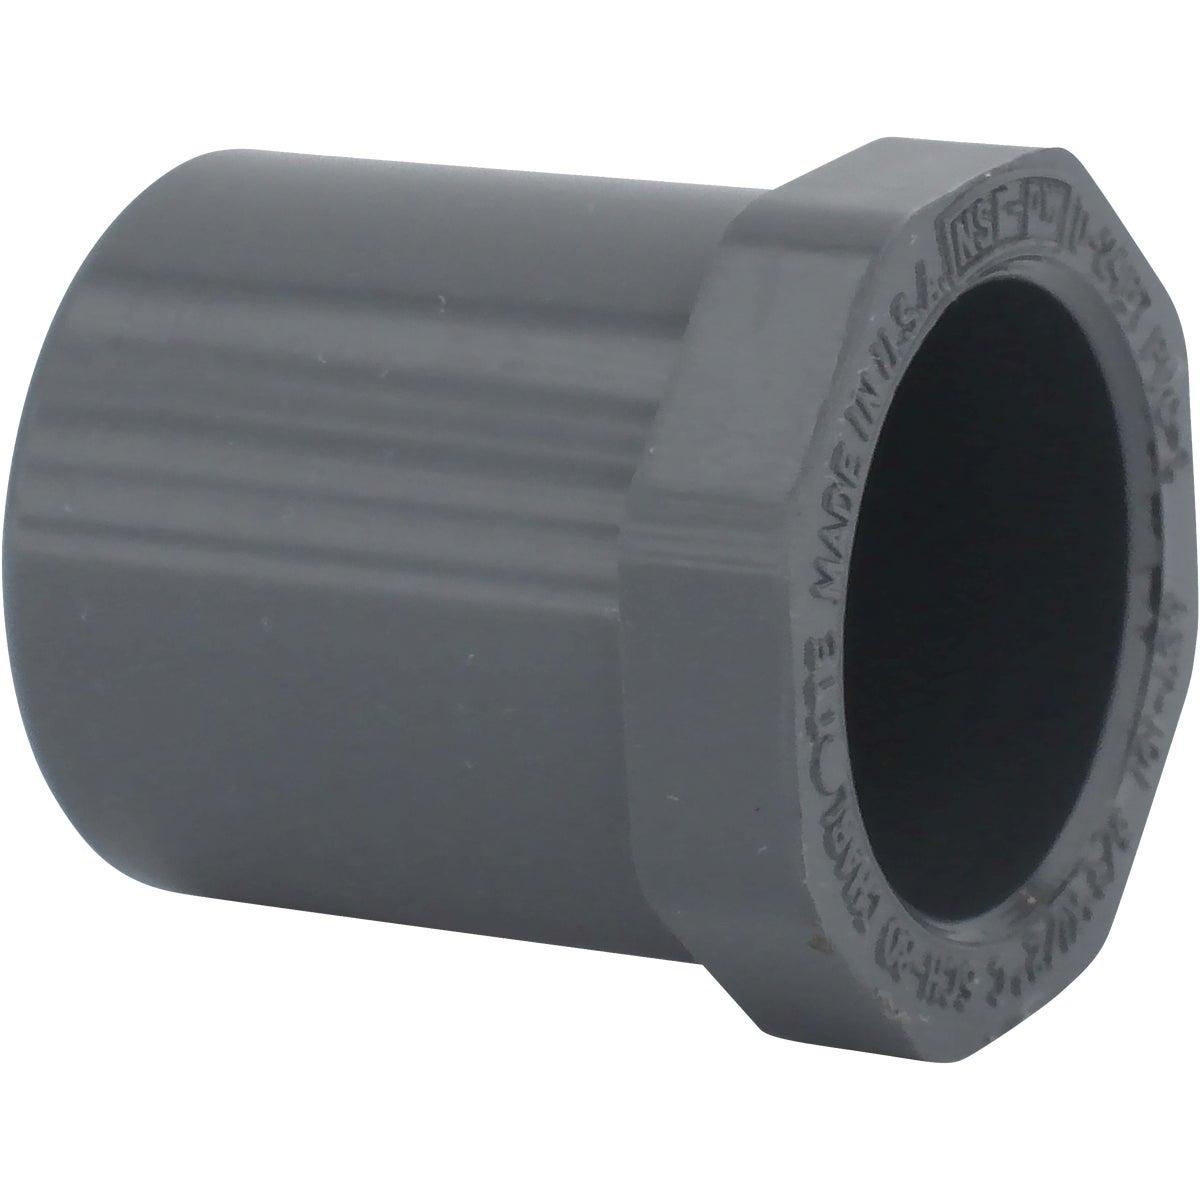 3/4X1/2 SPXS PVC BUSHING